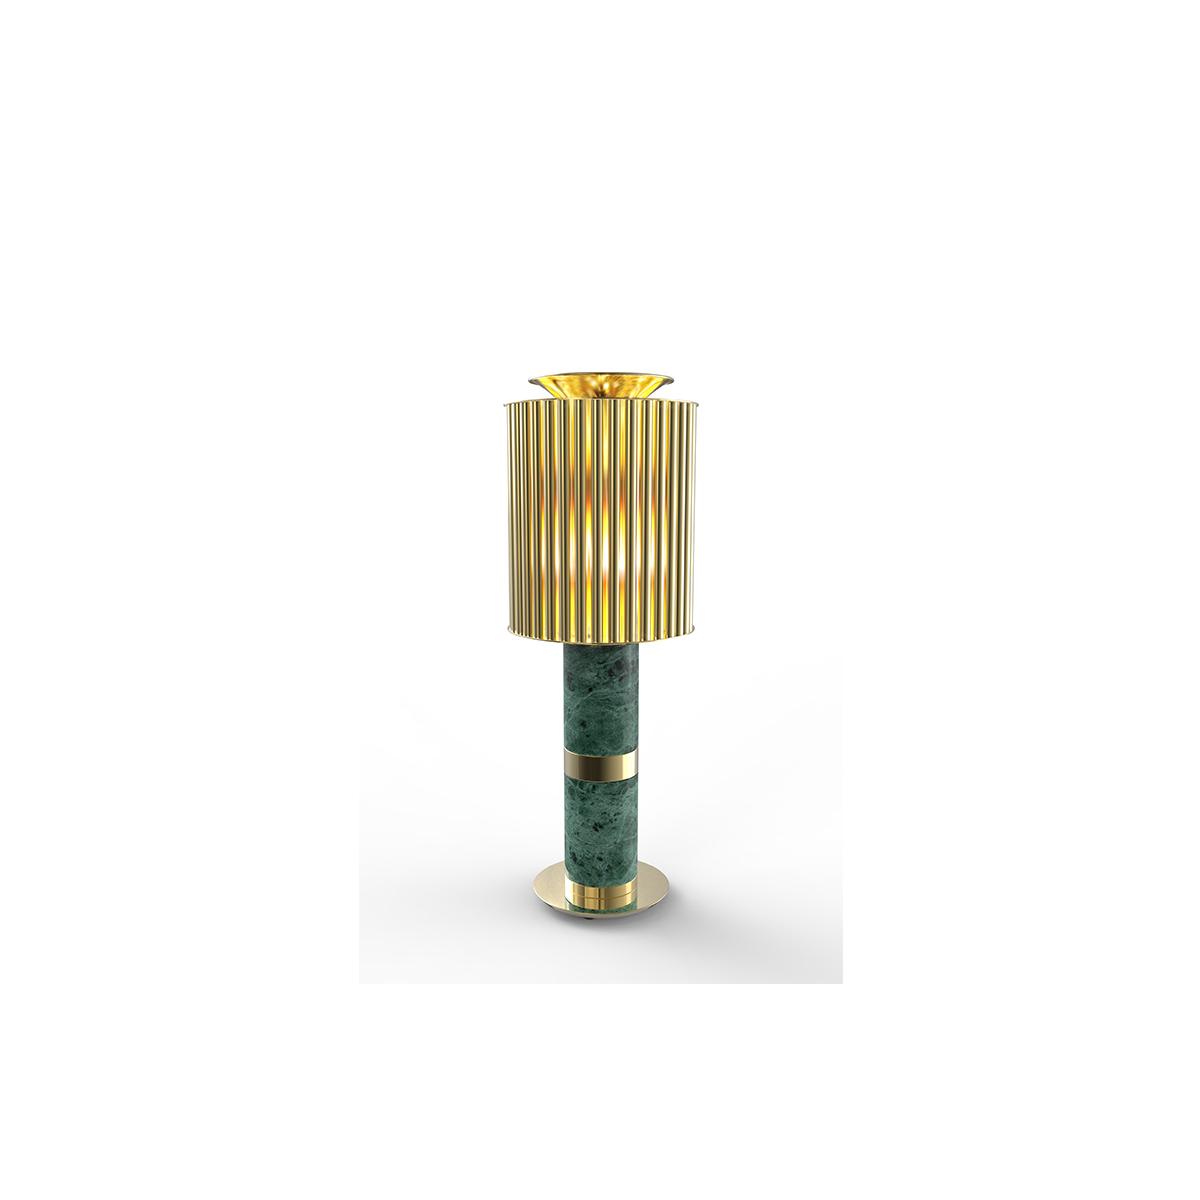 Lámparas de Mesa: Piezas poderosas para un proyecto elegante lámparas de mesa Lámparas de Mesa: Piezas poderosas para un proyecto elegante donna table lamp delightfull 03